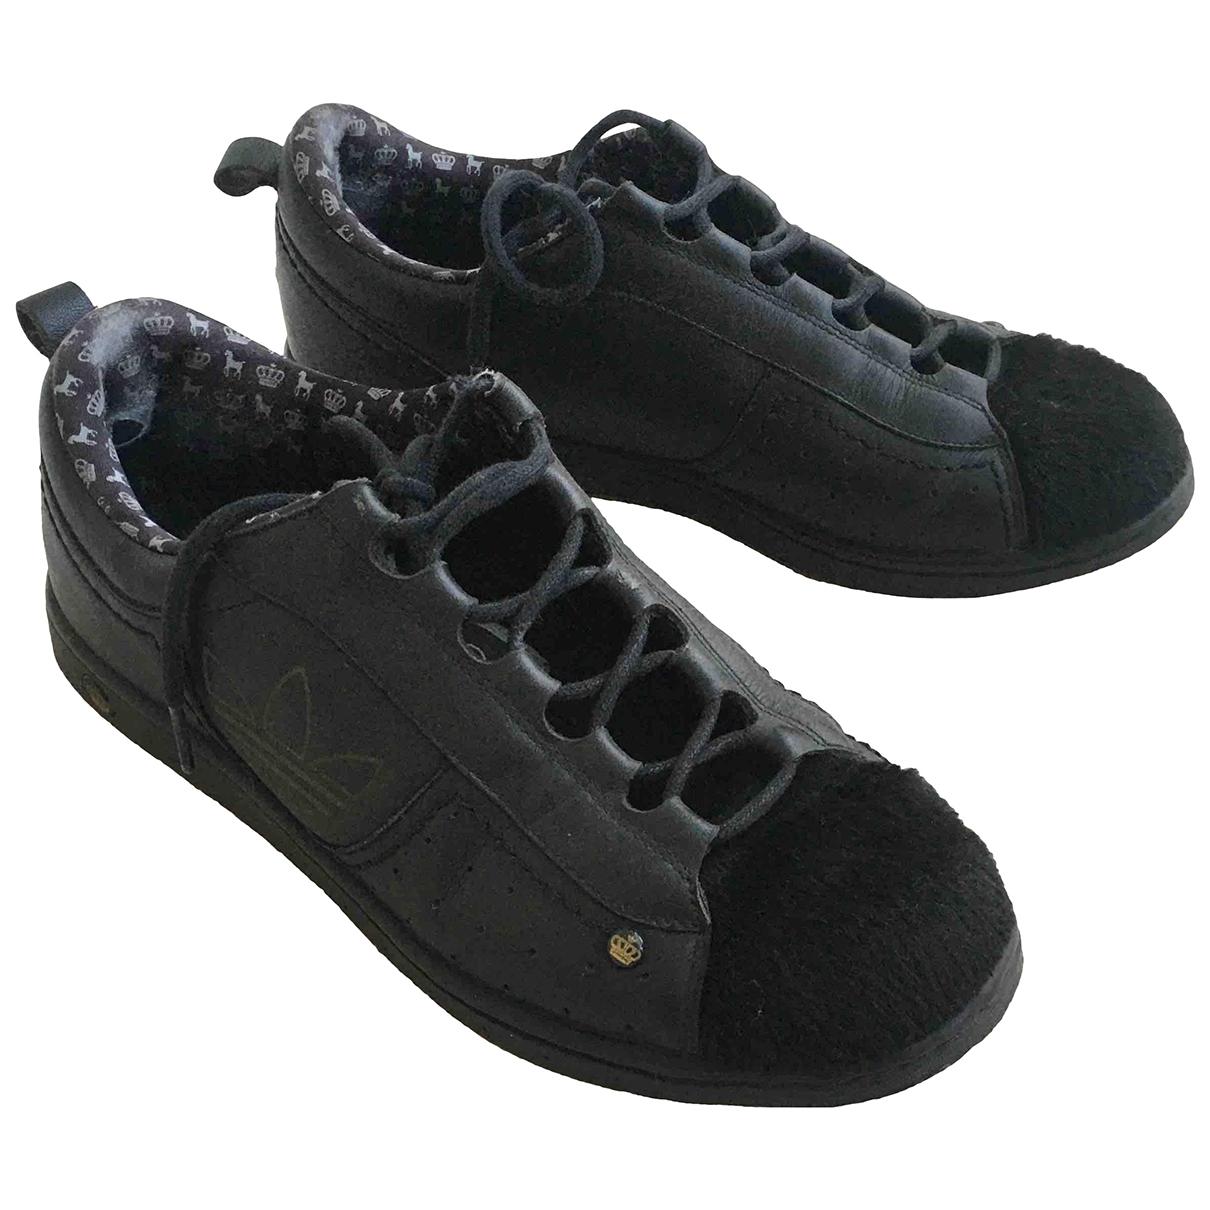 Adidas - Baskets Superstar pour femme en cuir - noir